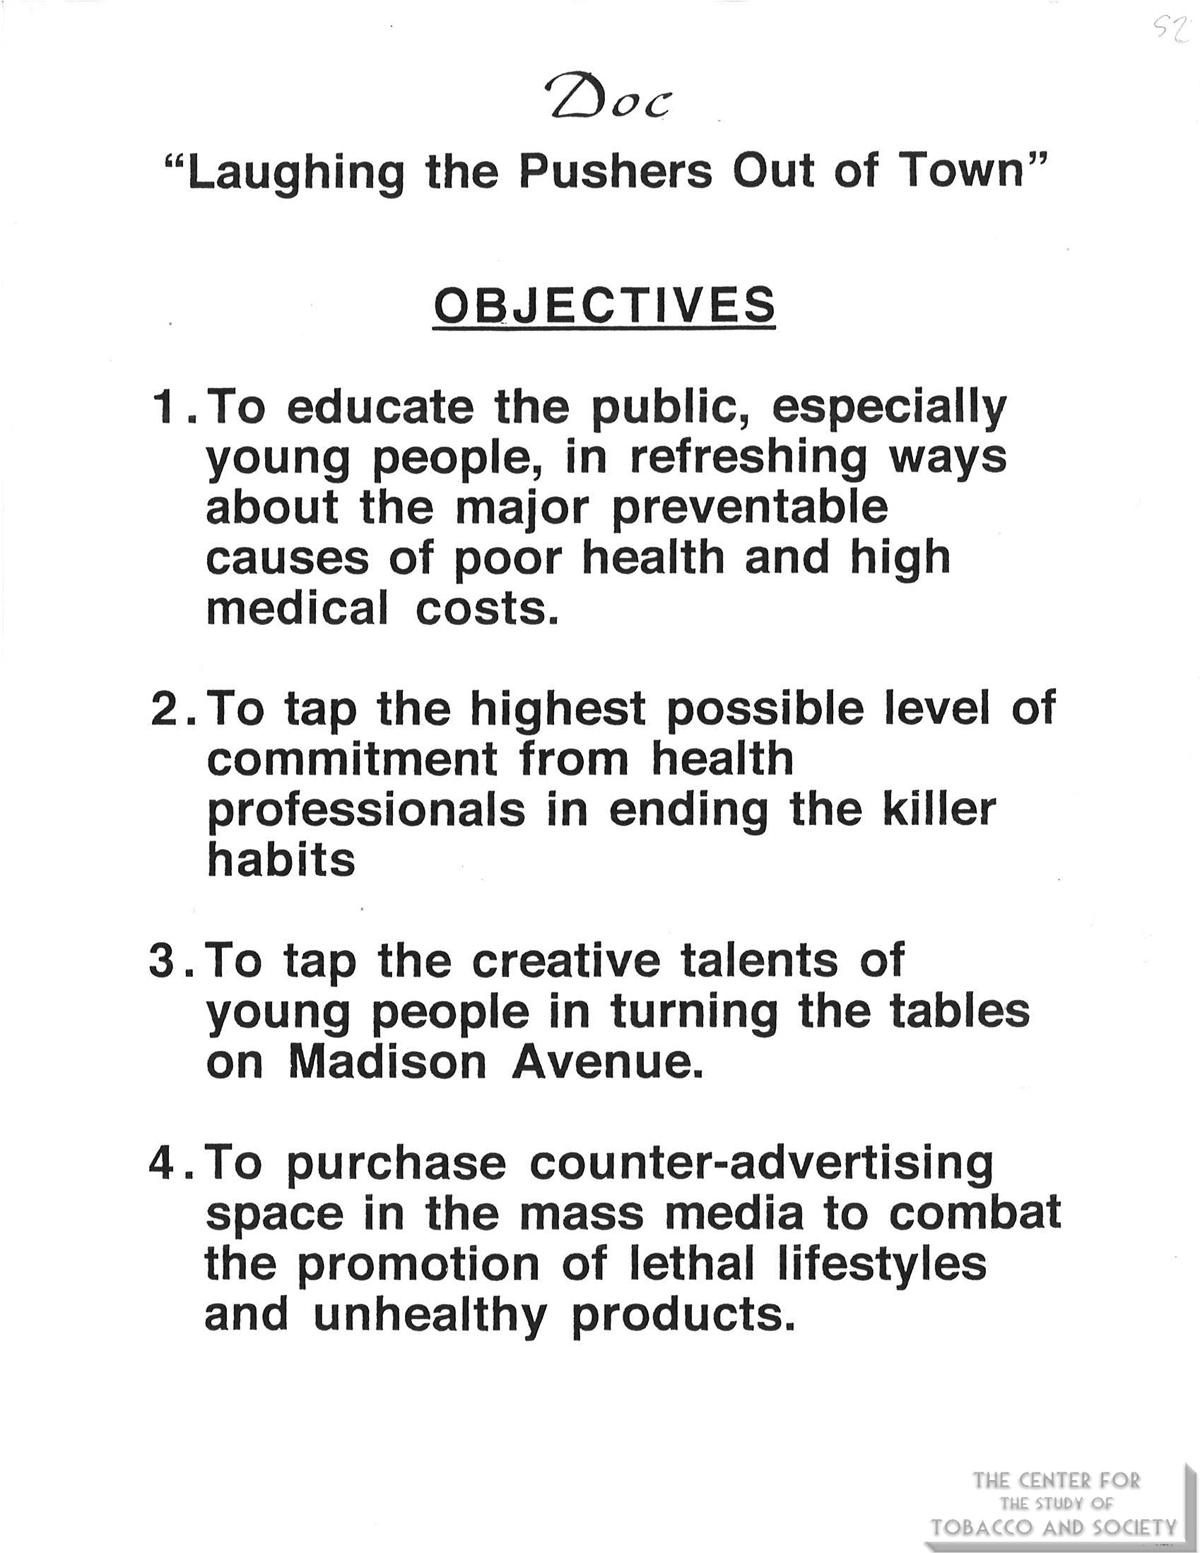 1978 List of DOCs 4 Objectives